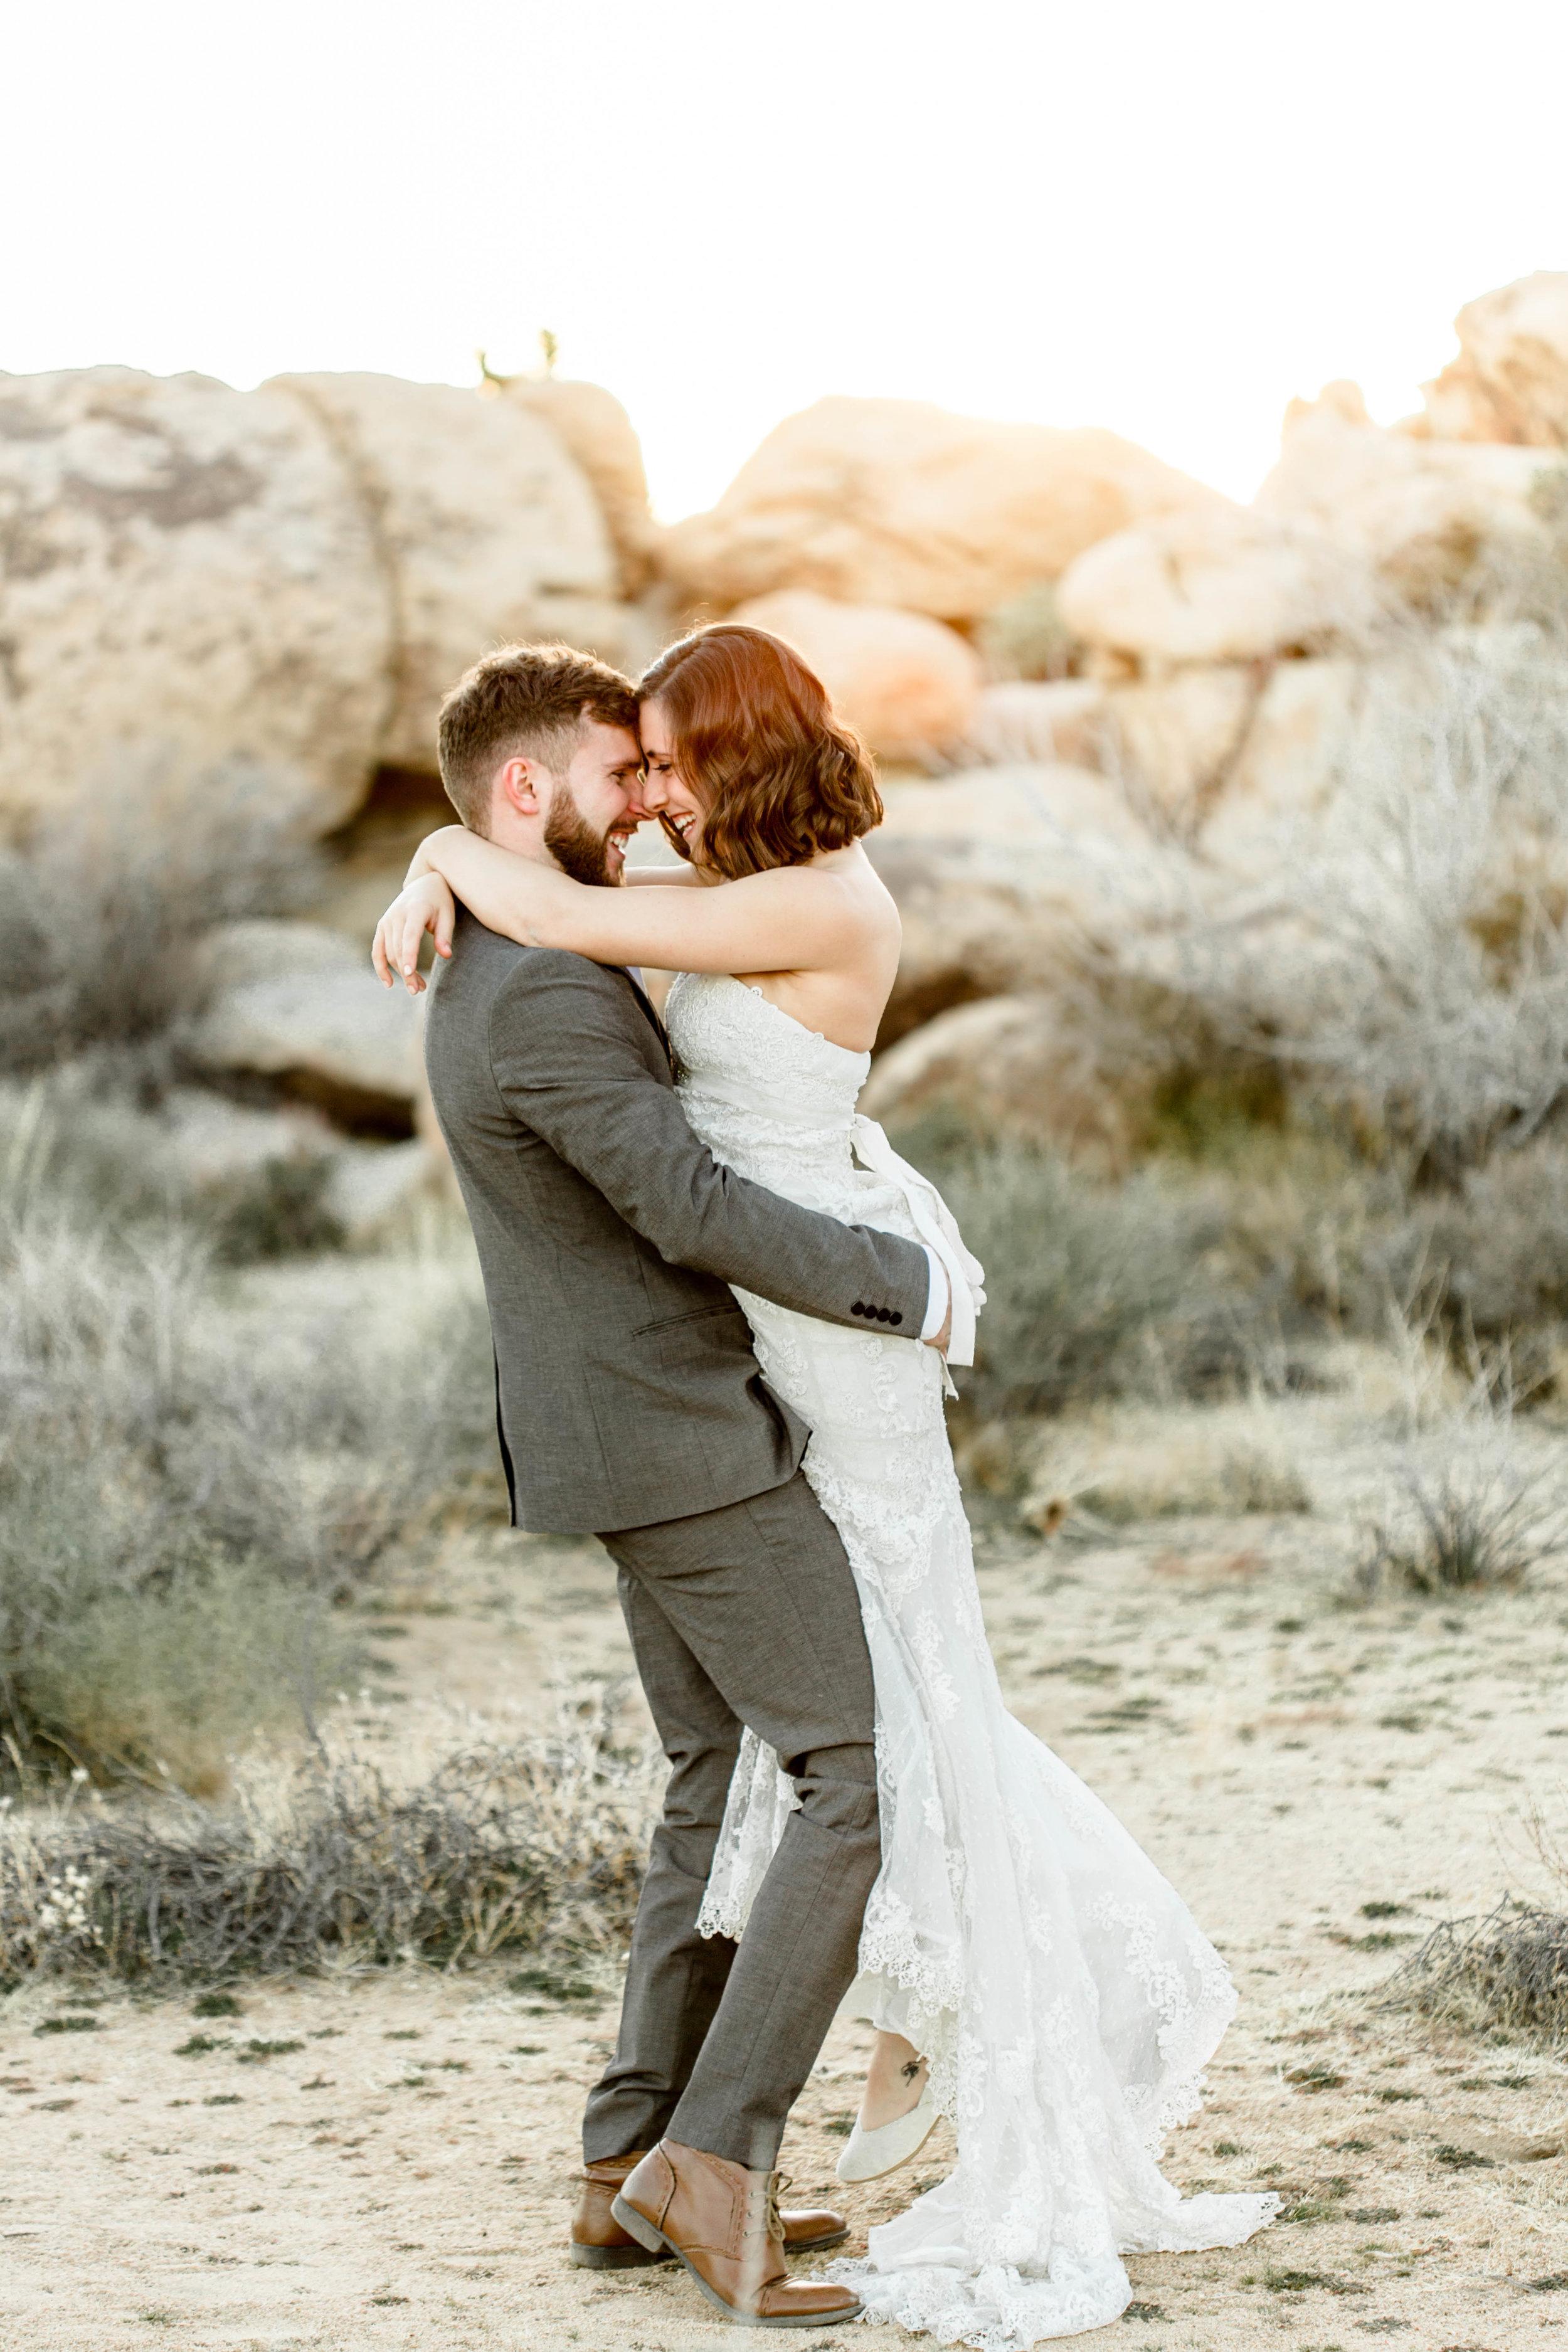 nicole-daacke-photography-joshua-tree-adventurous-elopement-wedding-national-park-wedding-photographer-adventure-wedding-adventurous-elopement-jtree-joshua-tree-national-park-wedding-photographer-intimate-weddings-golden-desert-love-24.jpg